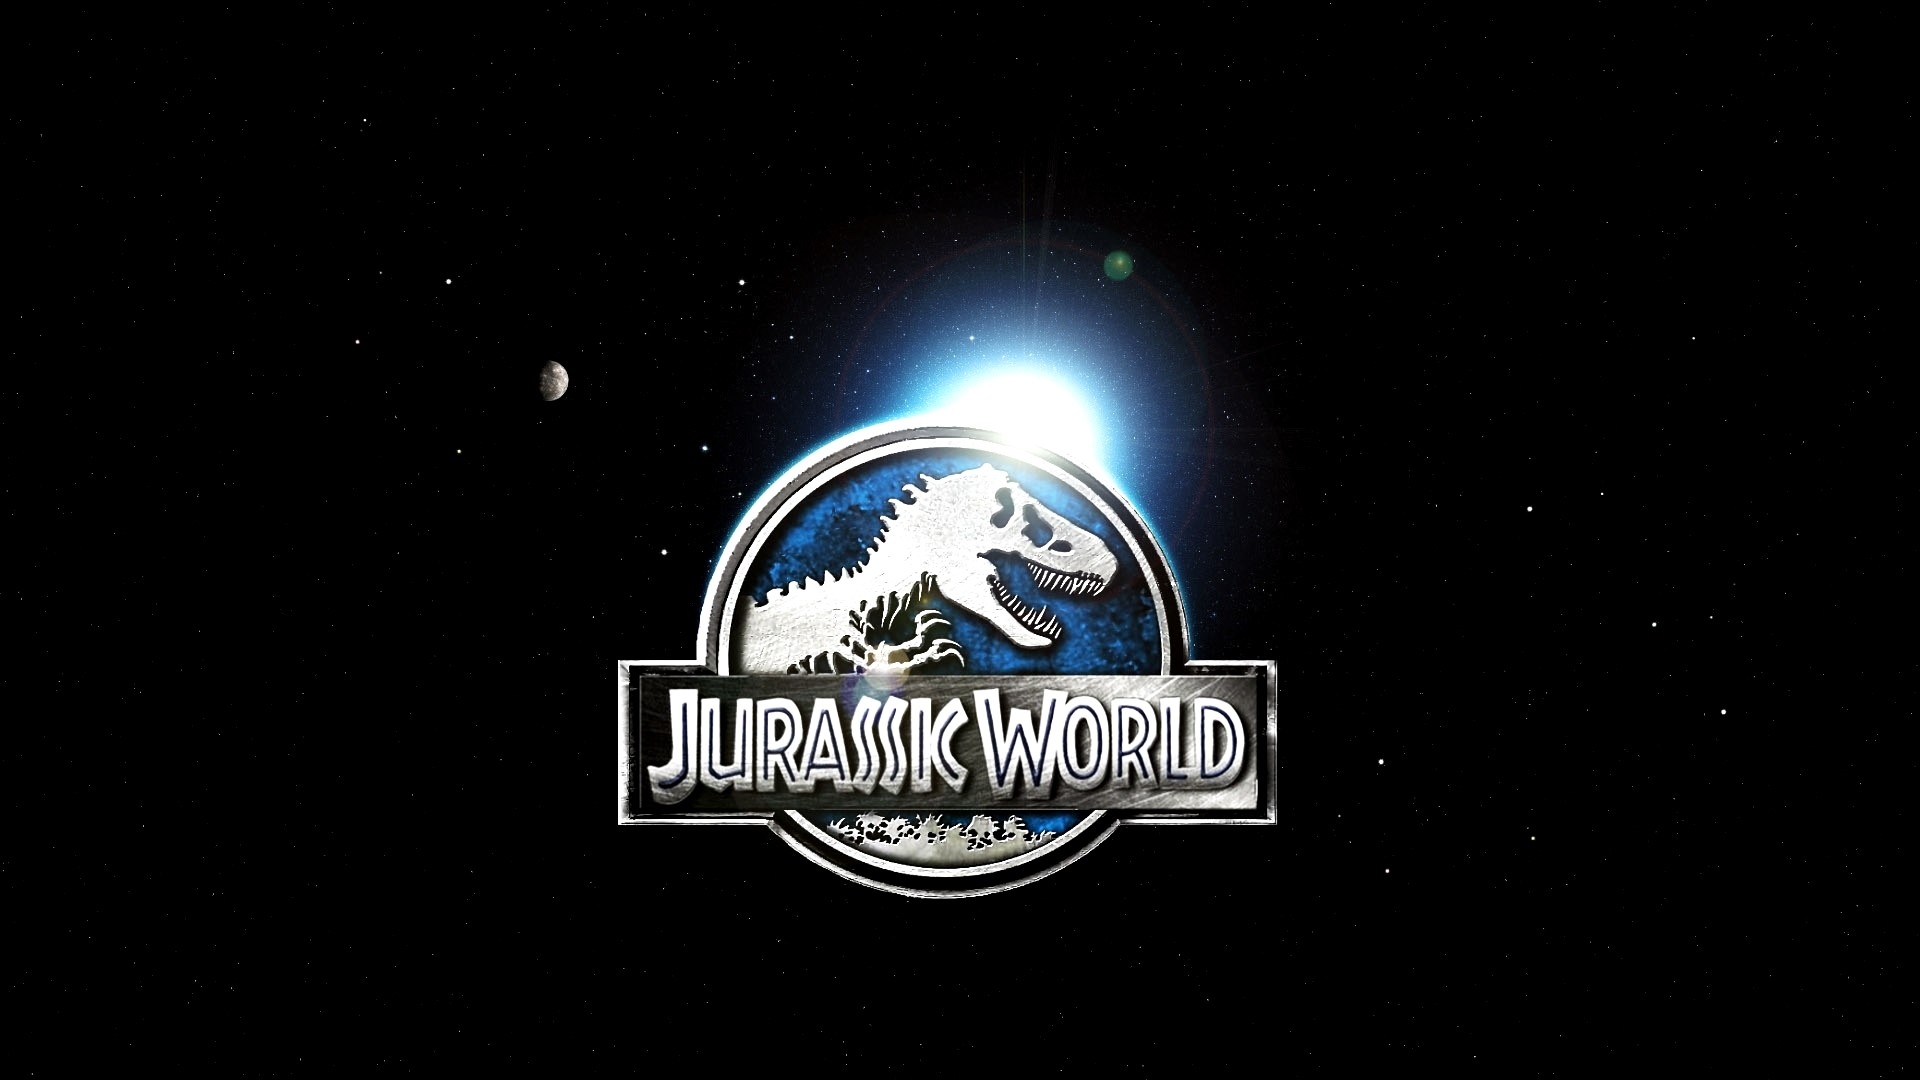 Jurassic World Movie Poster 2015